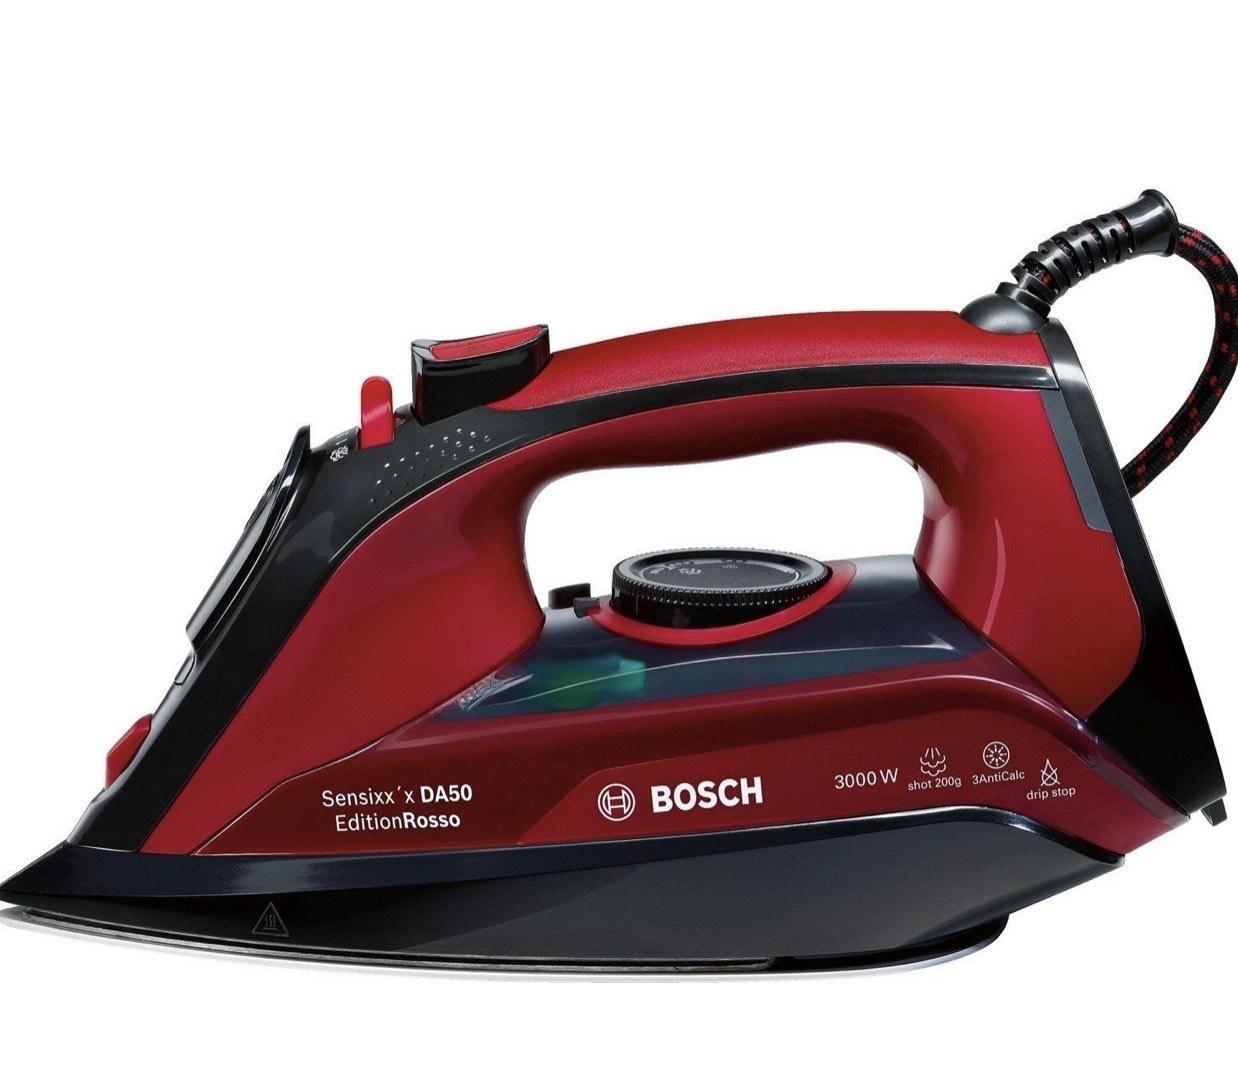 Plancha Bosch de Vapor 3000W